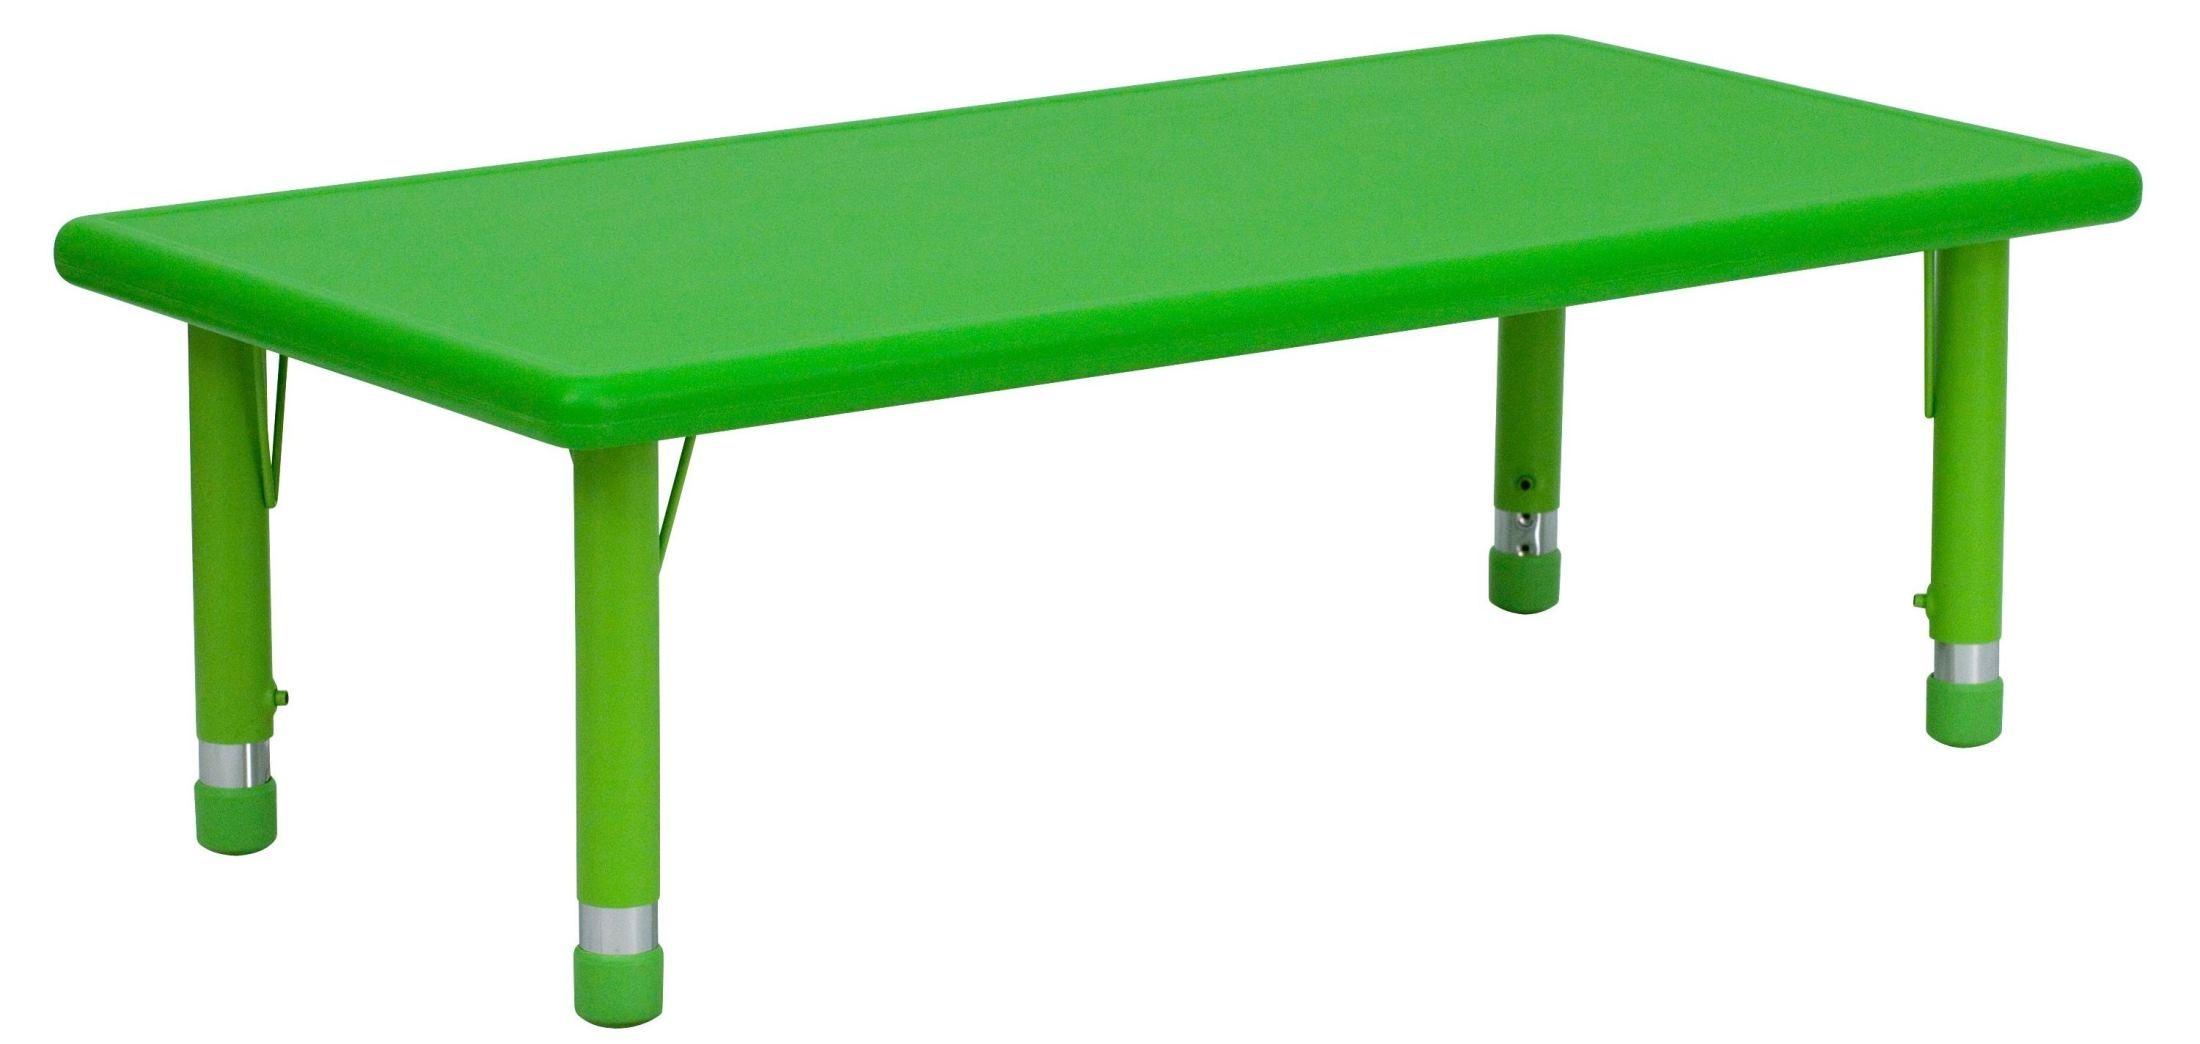 48 39 39 adjustable height rectangular green plastic activity. Black Bedroom Furniture Sets. Home Design Ideas